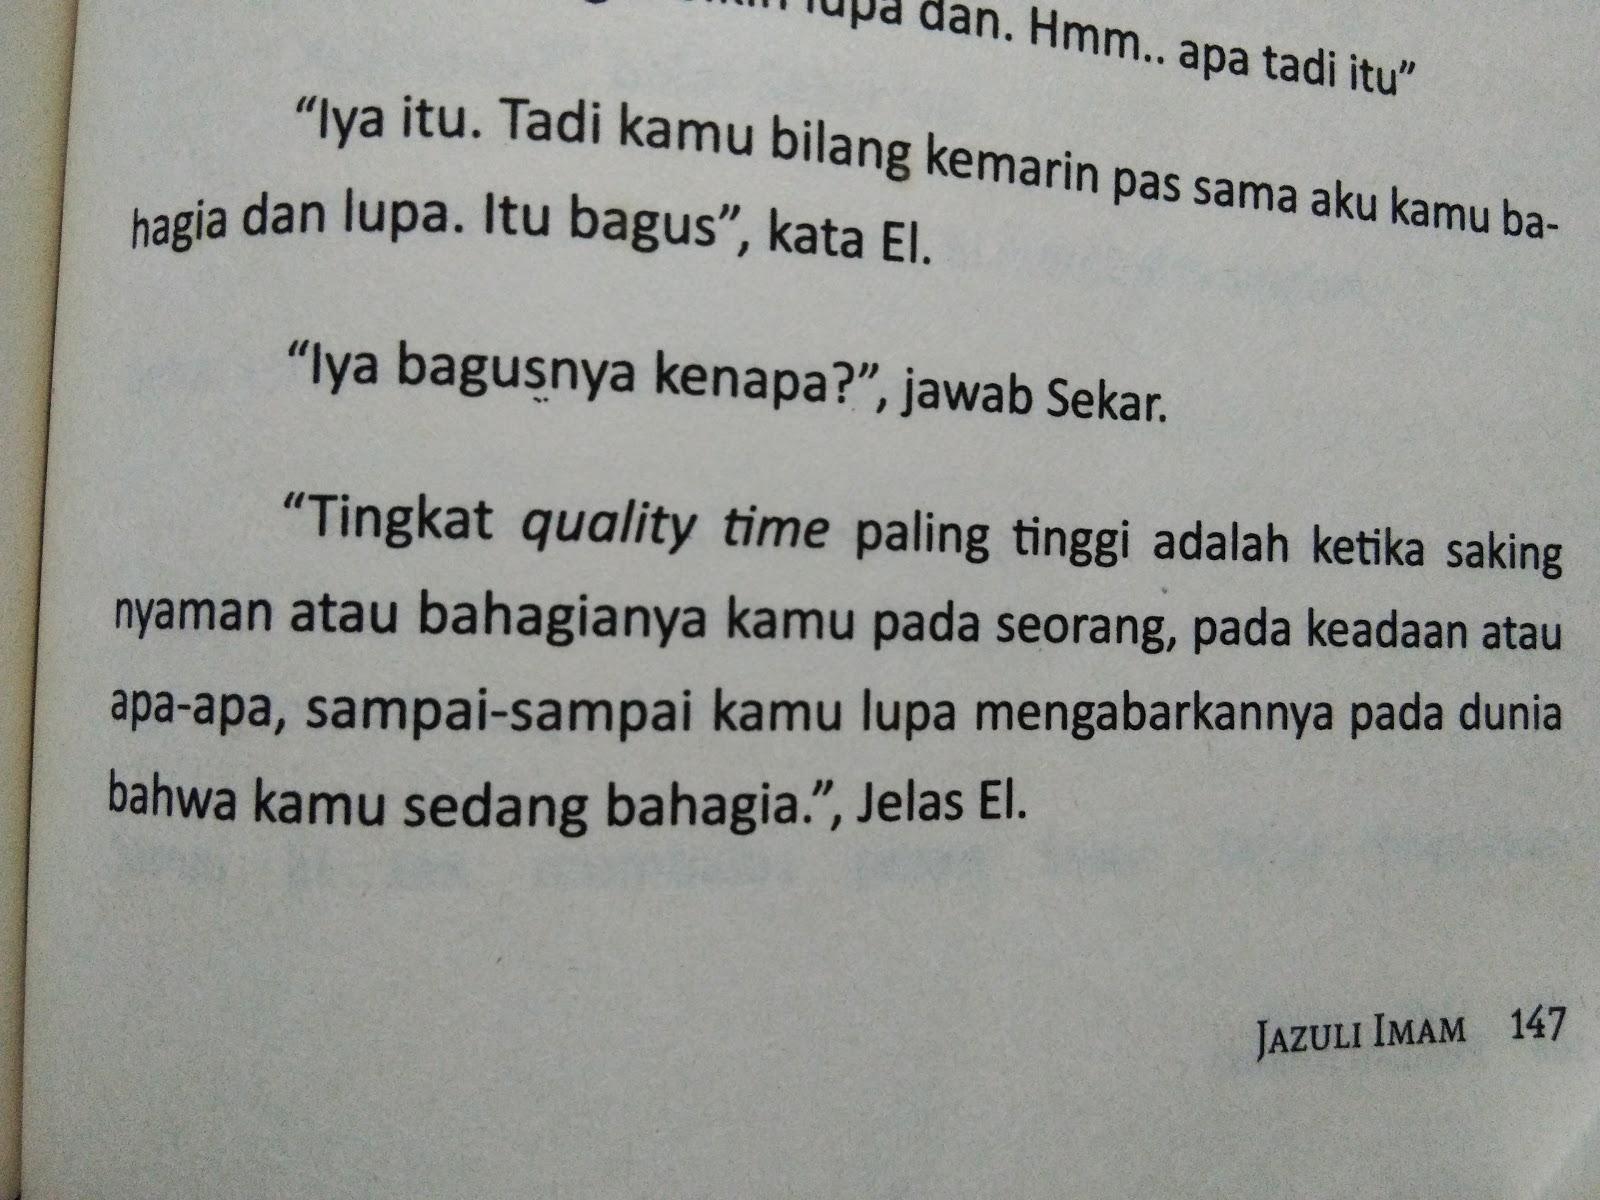 Download Novel Pejalan Anarki Pdf Wiring Library Farmall 460 Diagram You Might Also Like Review Buku